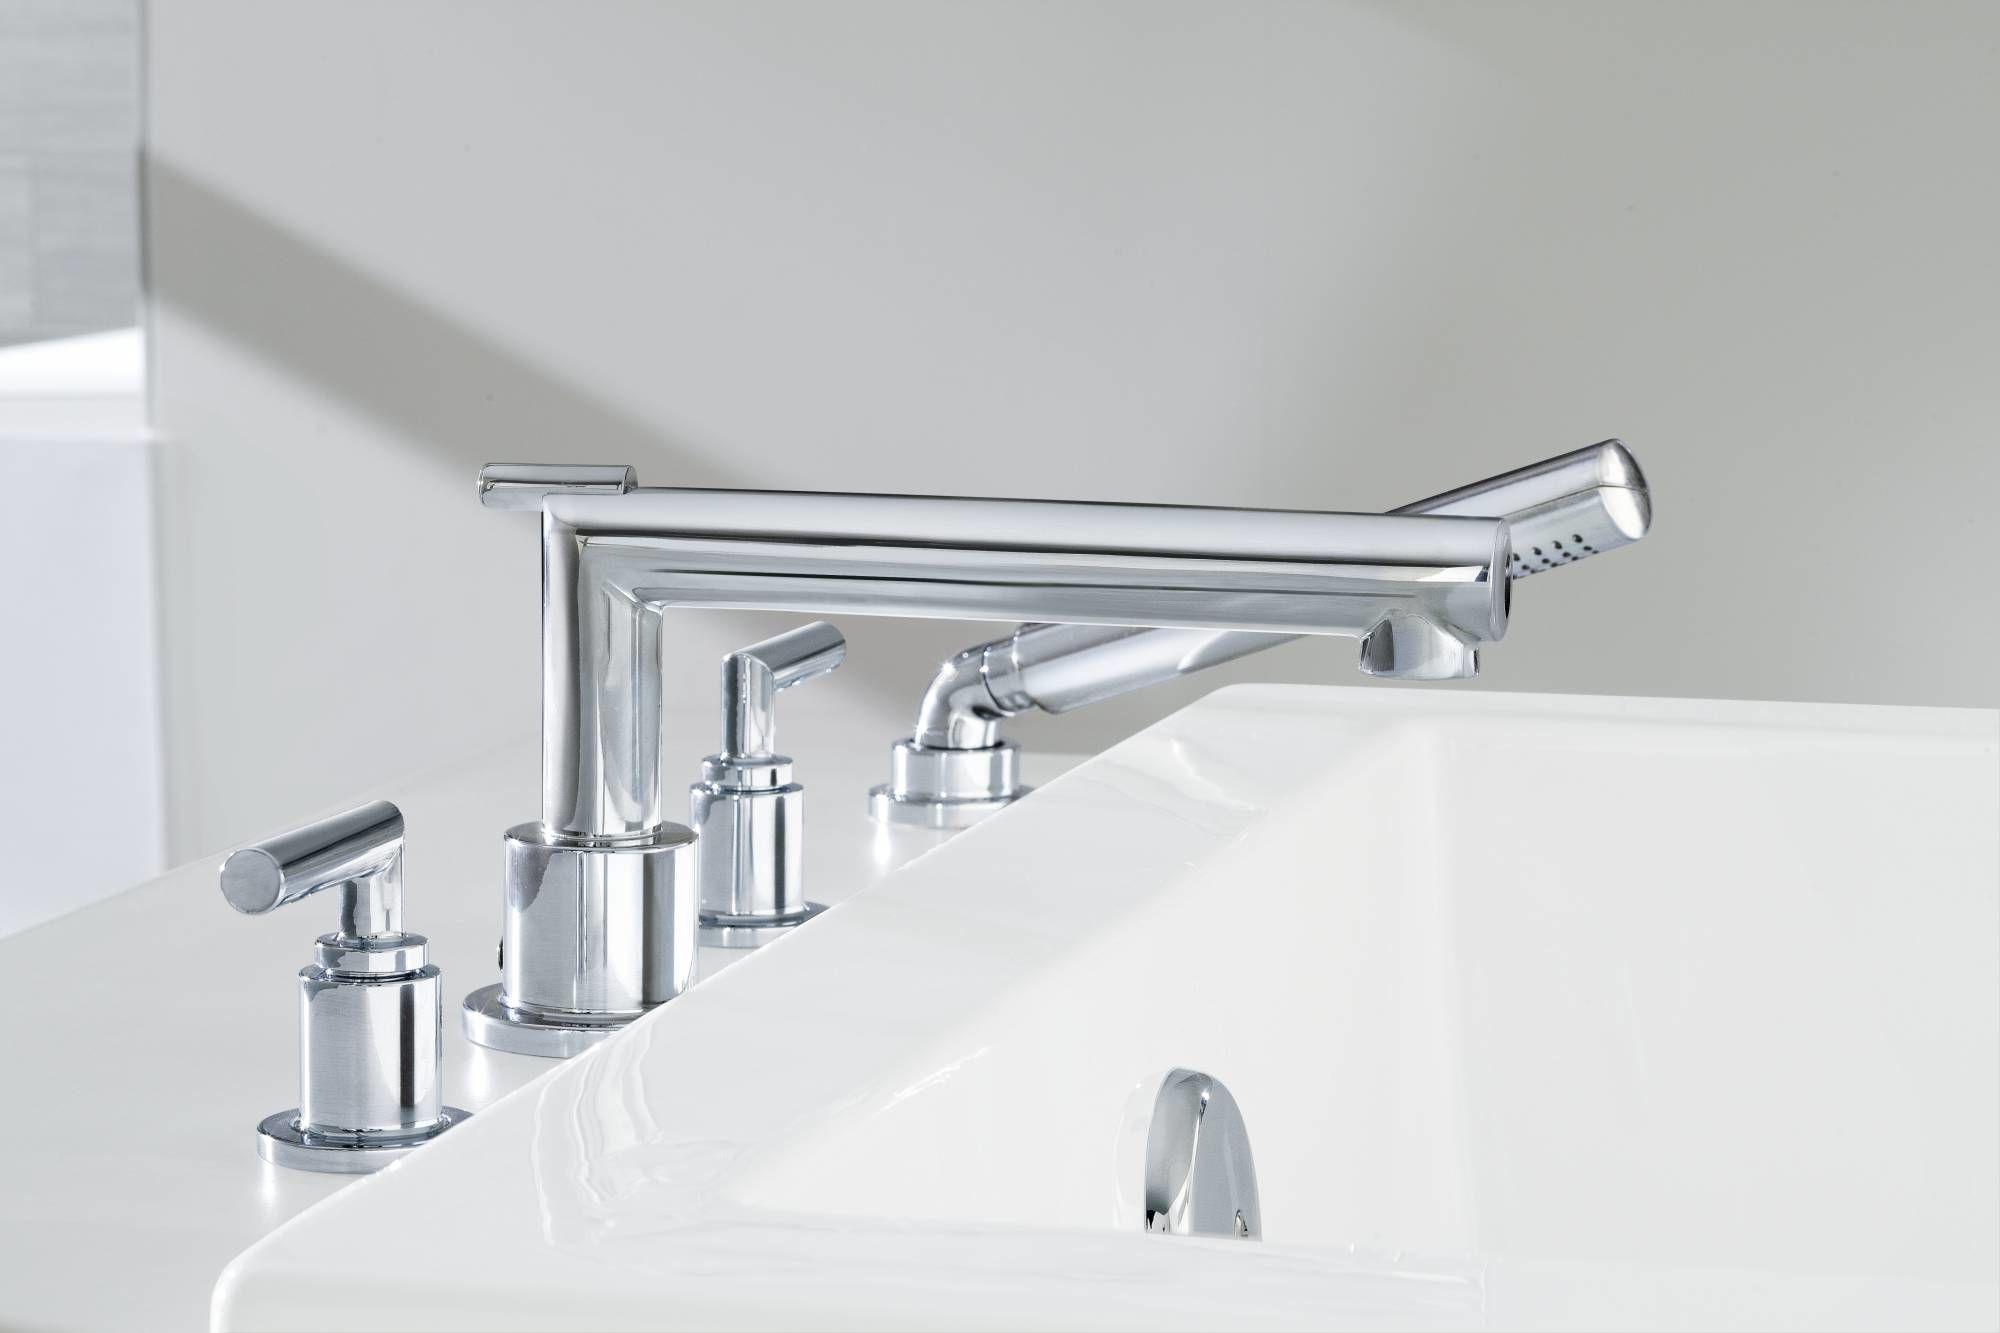 Moen TS93004BN Brushed Nickel Deck Mounted Roman Tub Faucet Trim ...